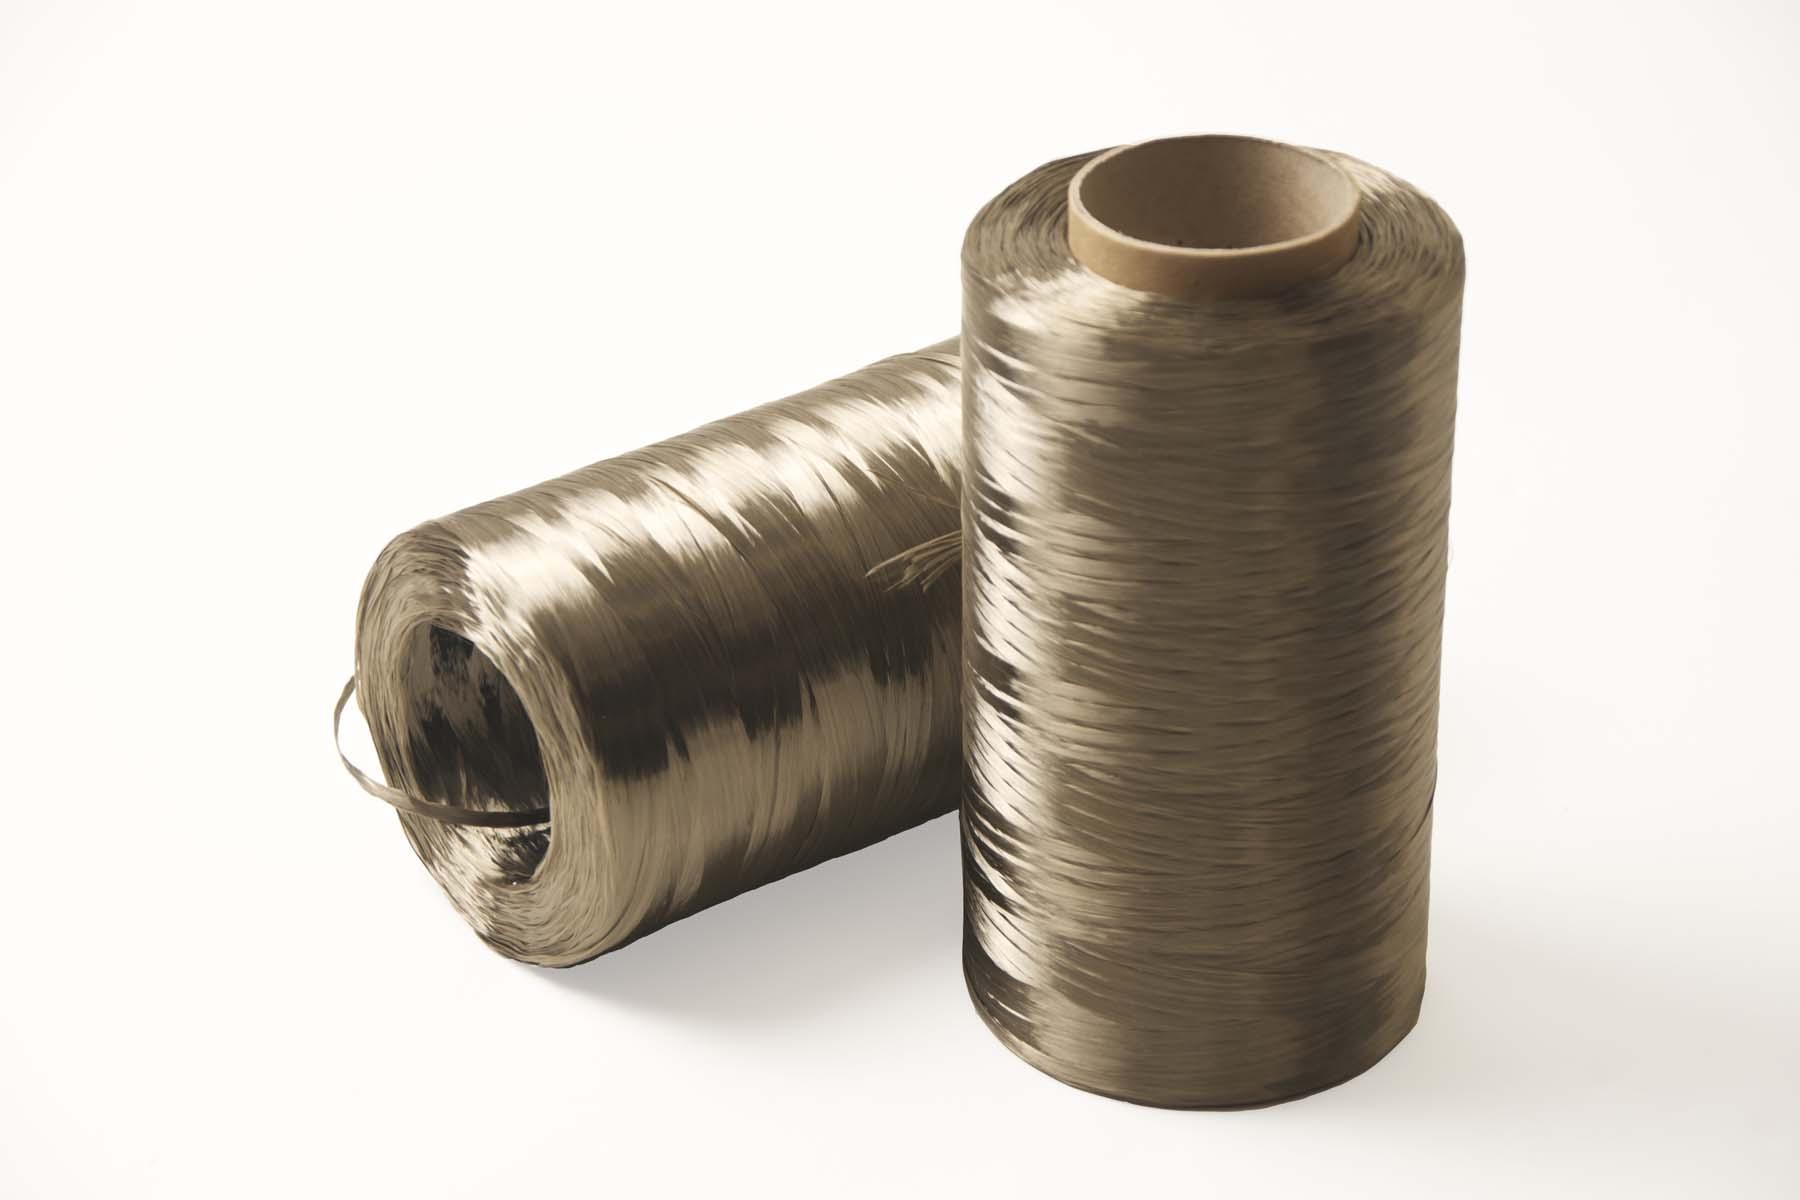 Mafic-Basalt-Fiber-Products_11.jpg